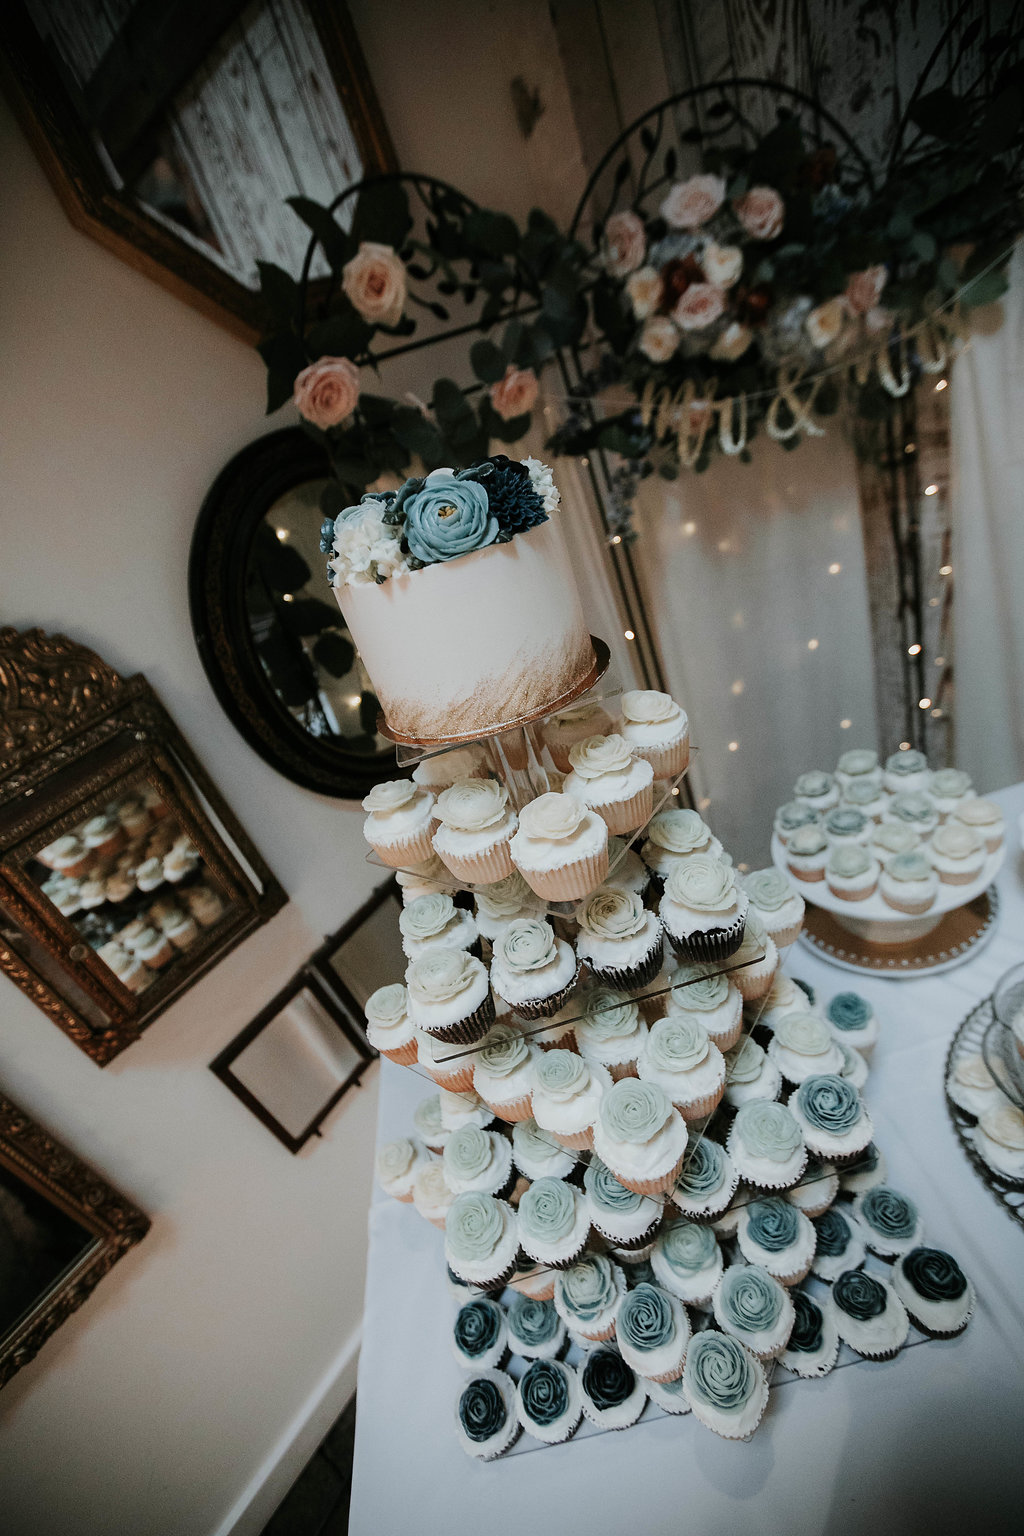 The_Big_Fake_wedding_Seattle_Within_sodo_wedding_by_Adina_Preston_Weddings_255.JPG